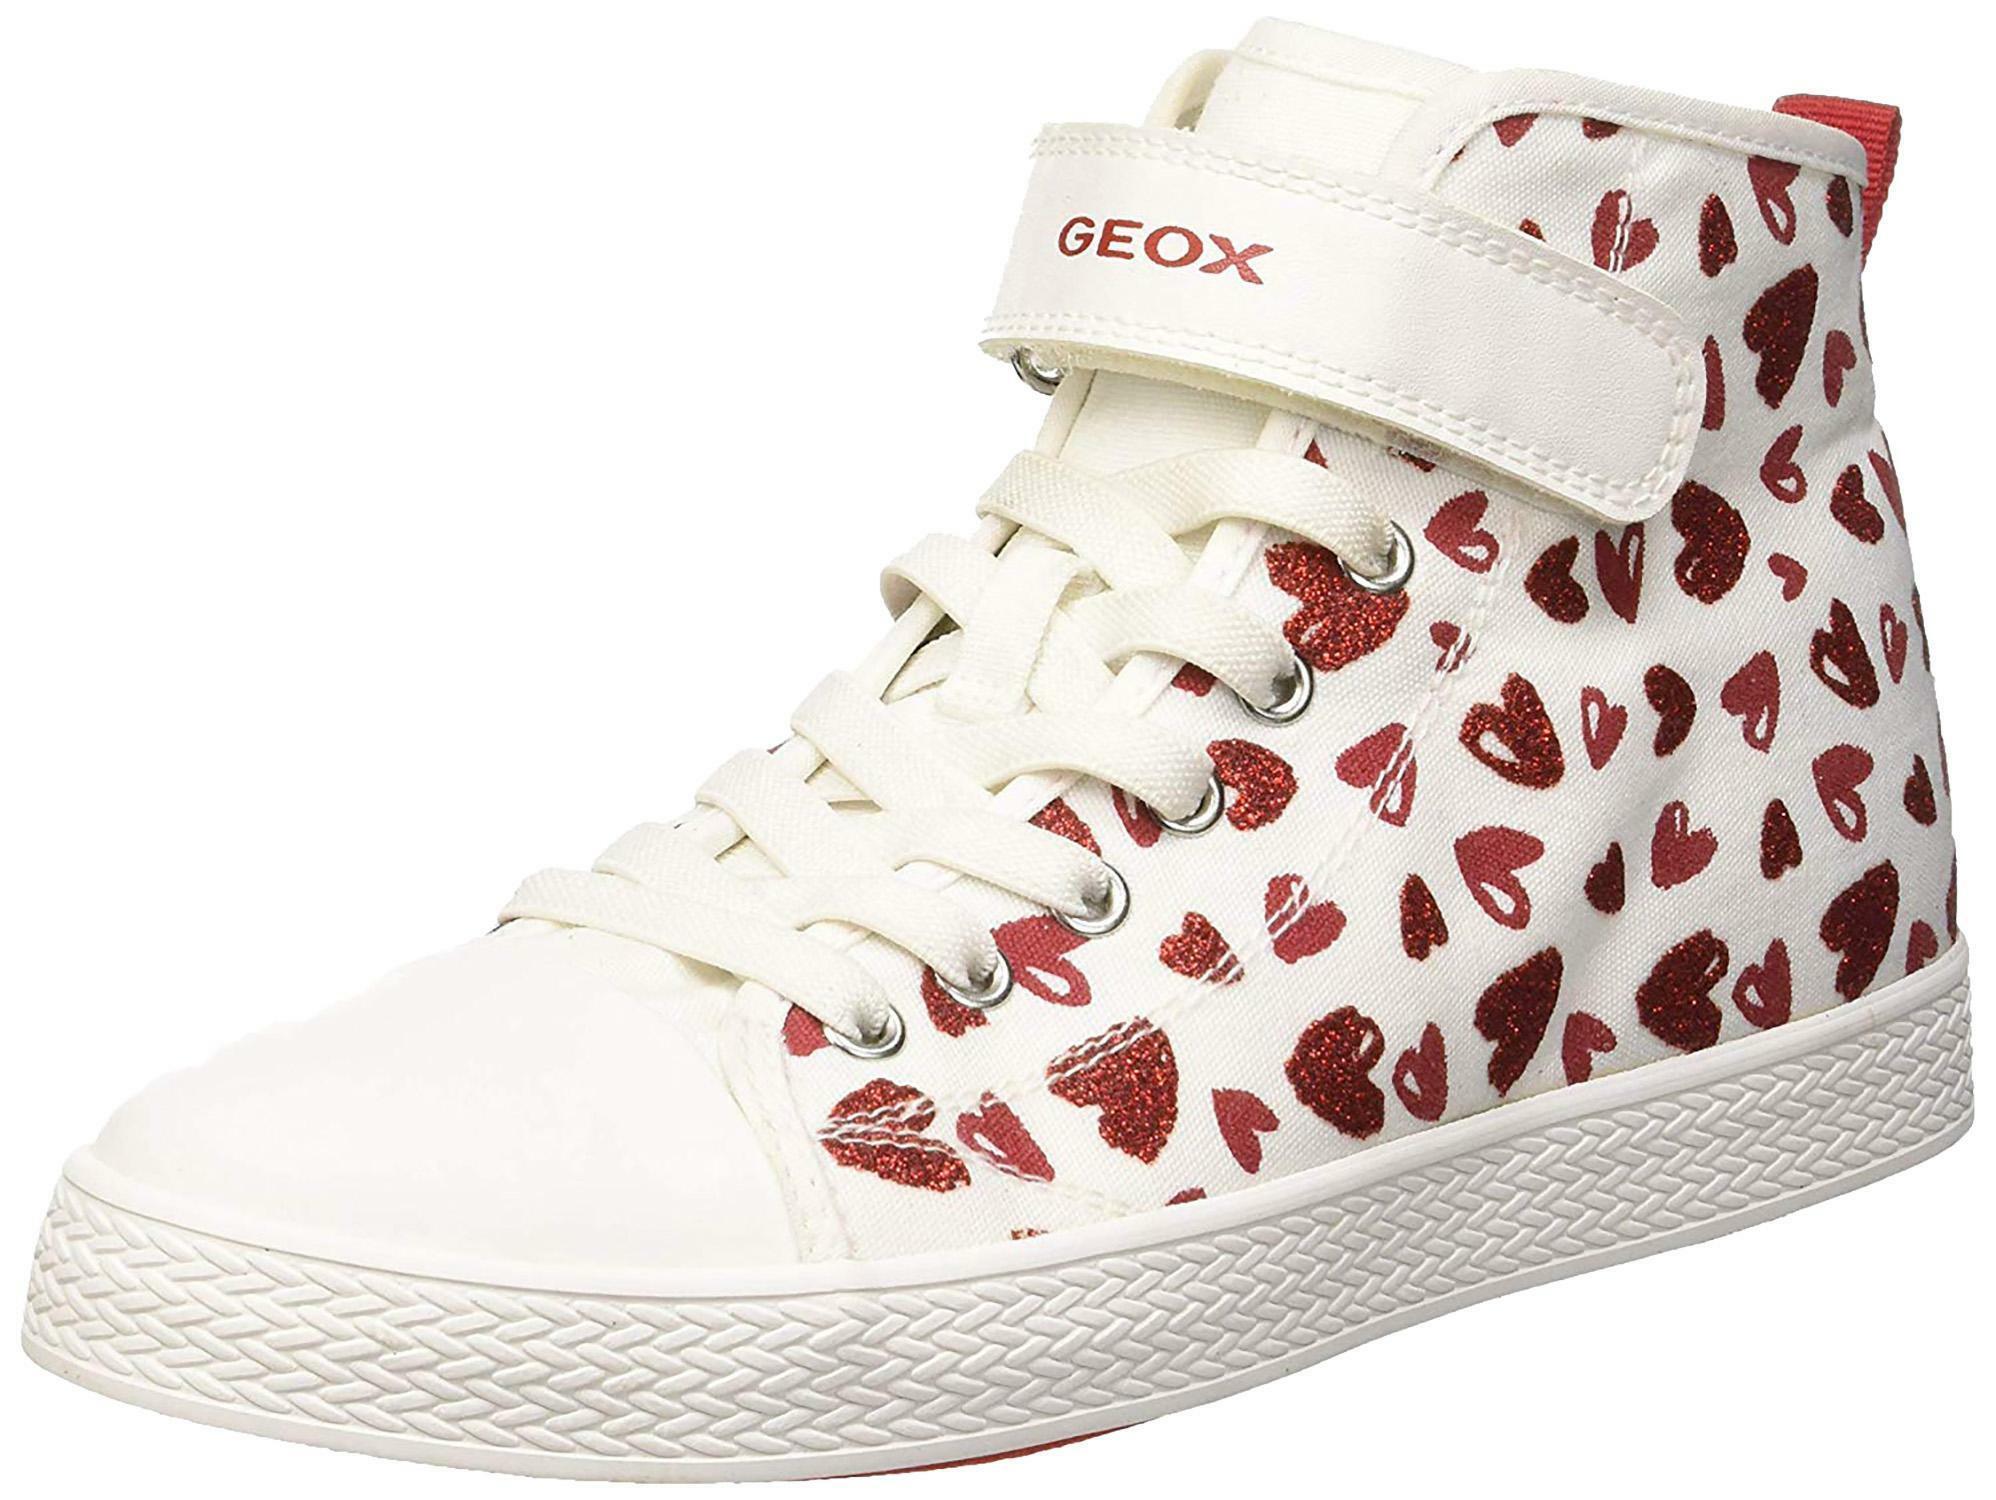 geox j ciak g scarpe sportive bambina bianche j9204ac0050